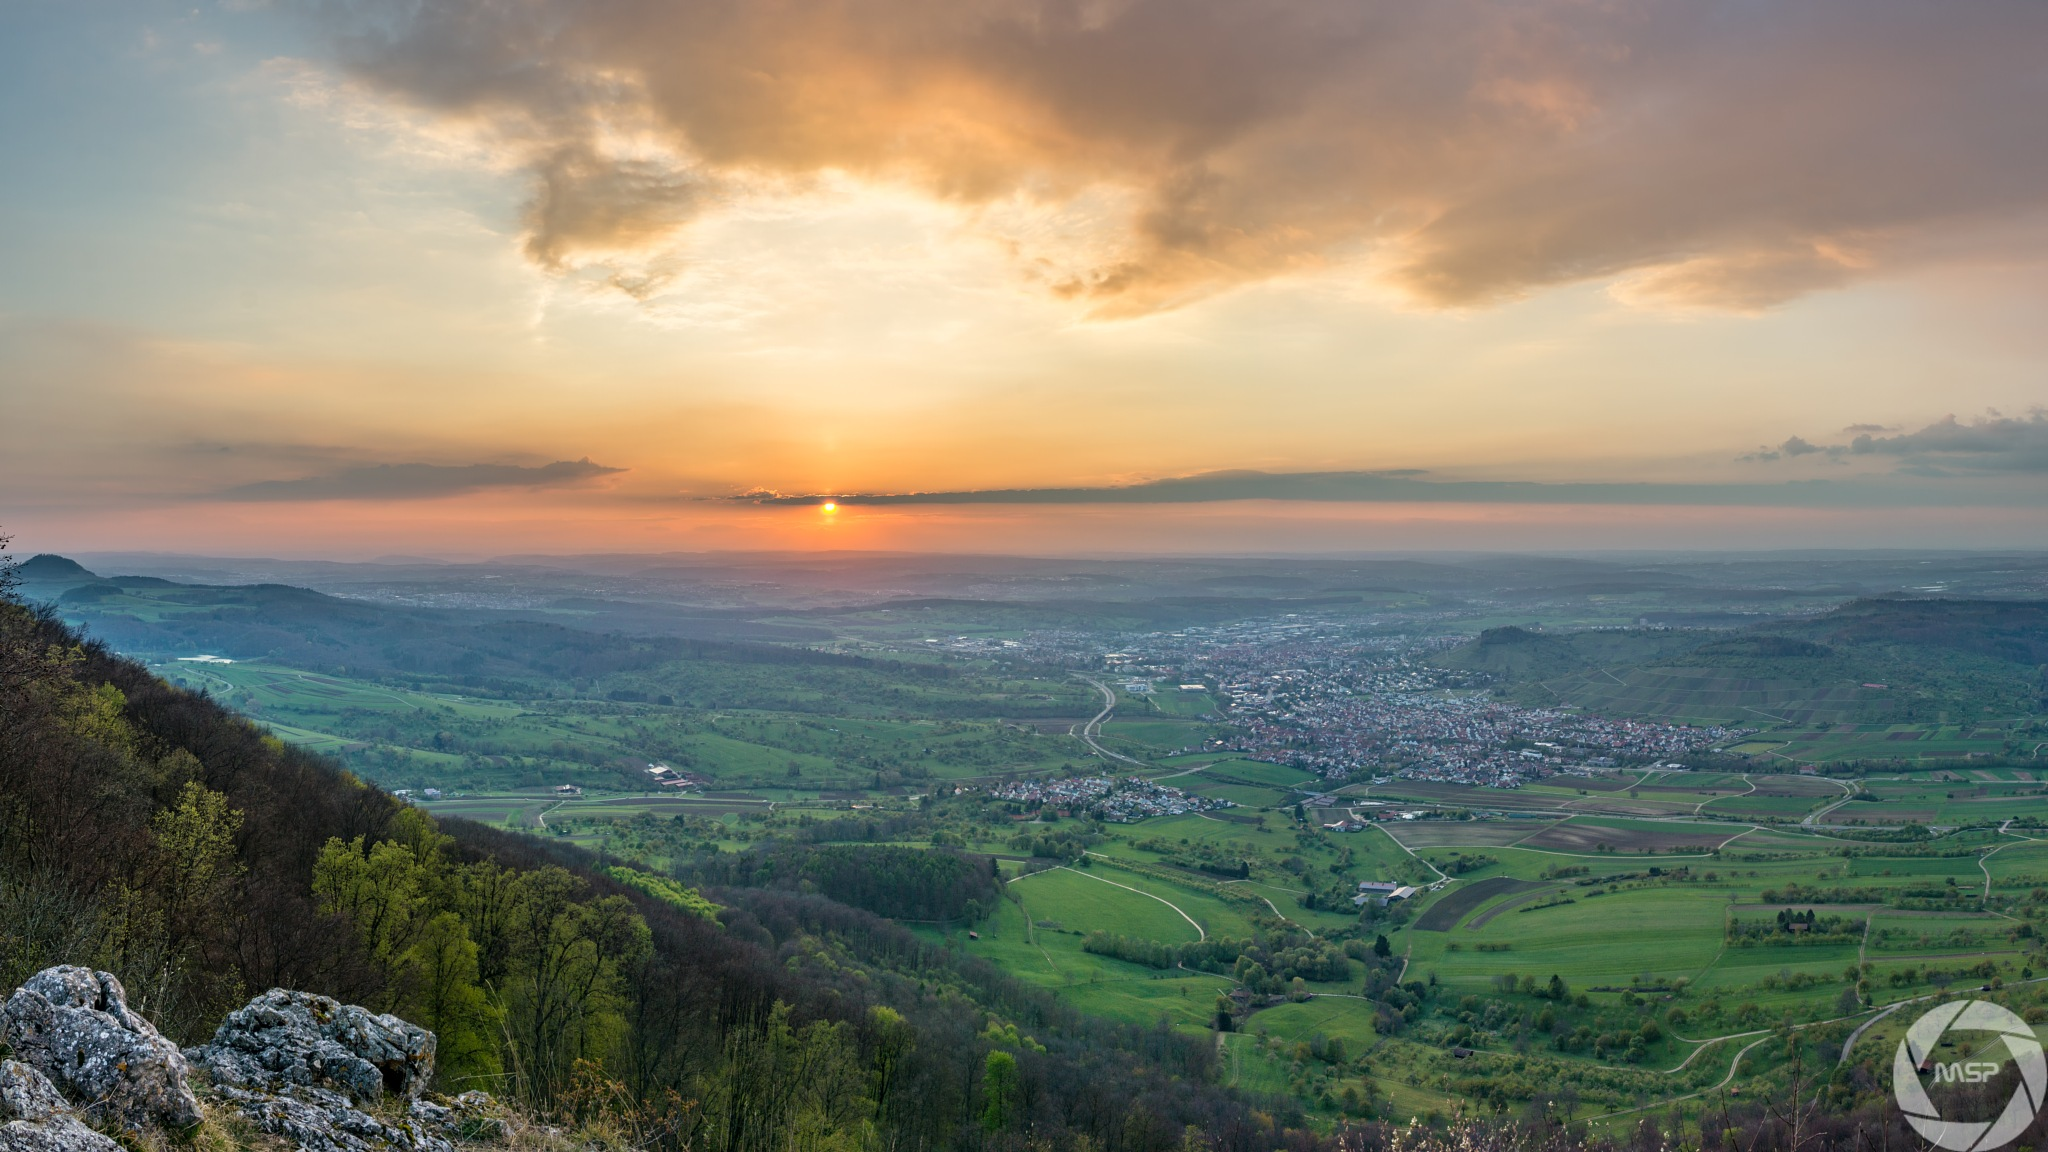 Mystical Sunset  by Martin Schunack